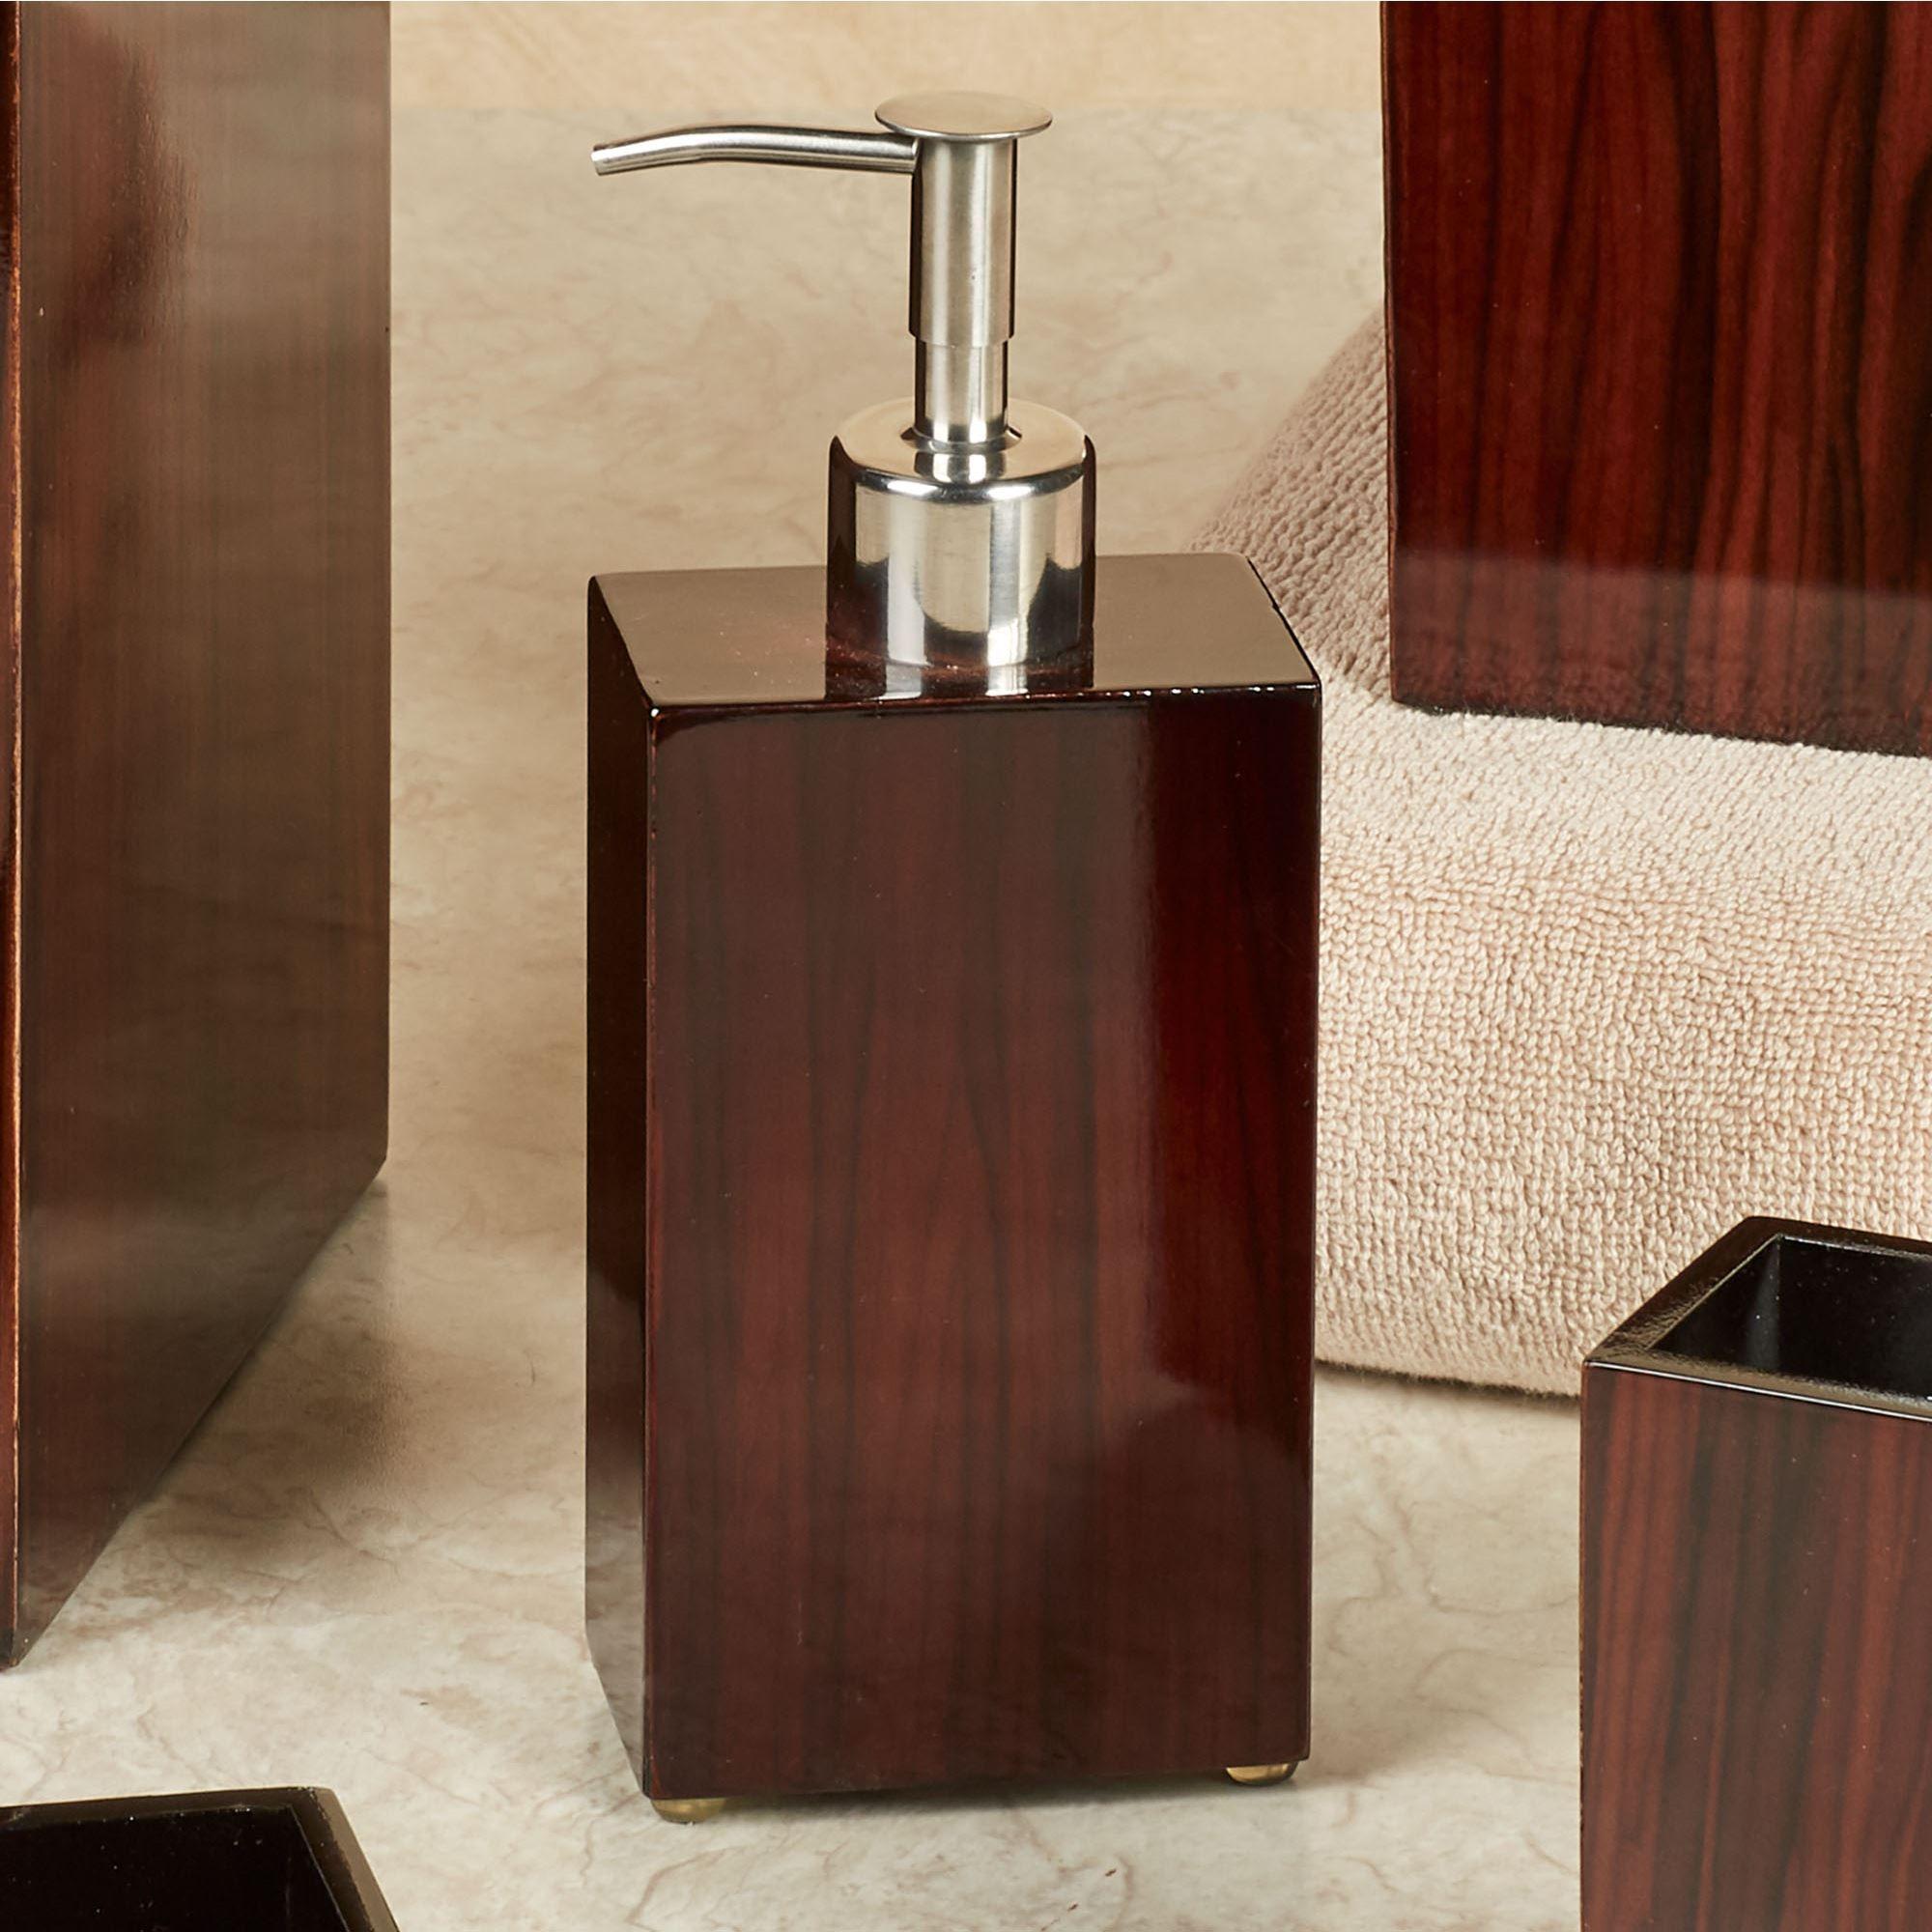 Madera Lotion Soap Dispenser Rich Mahogany